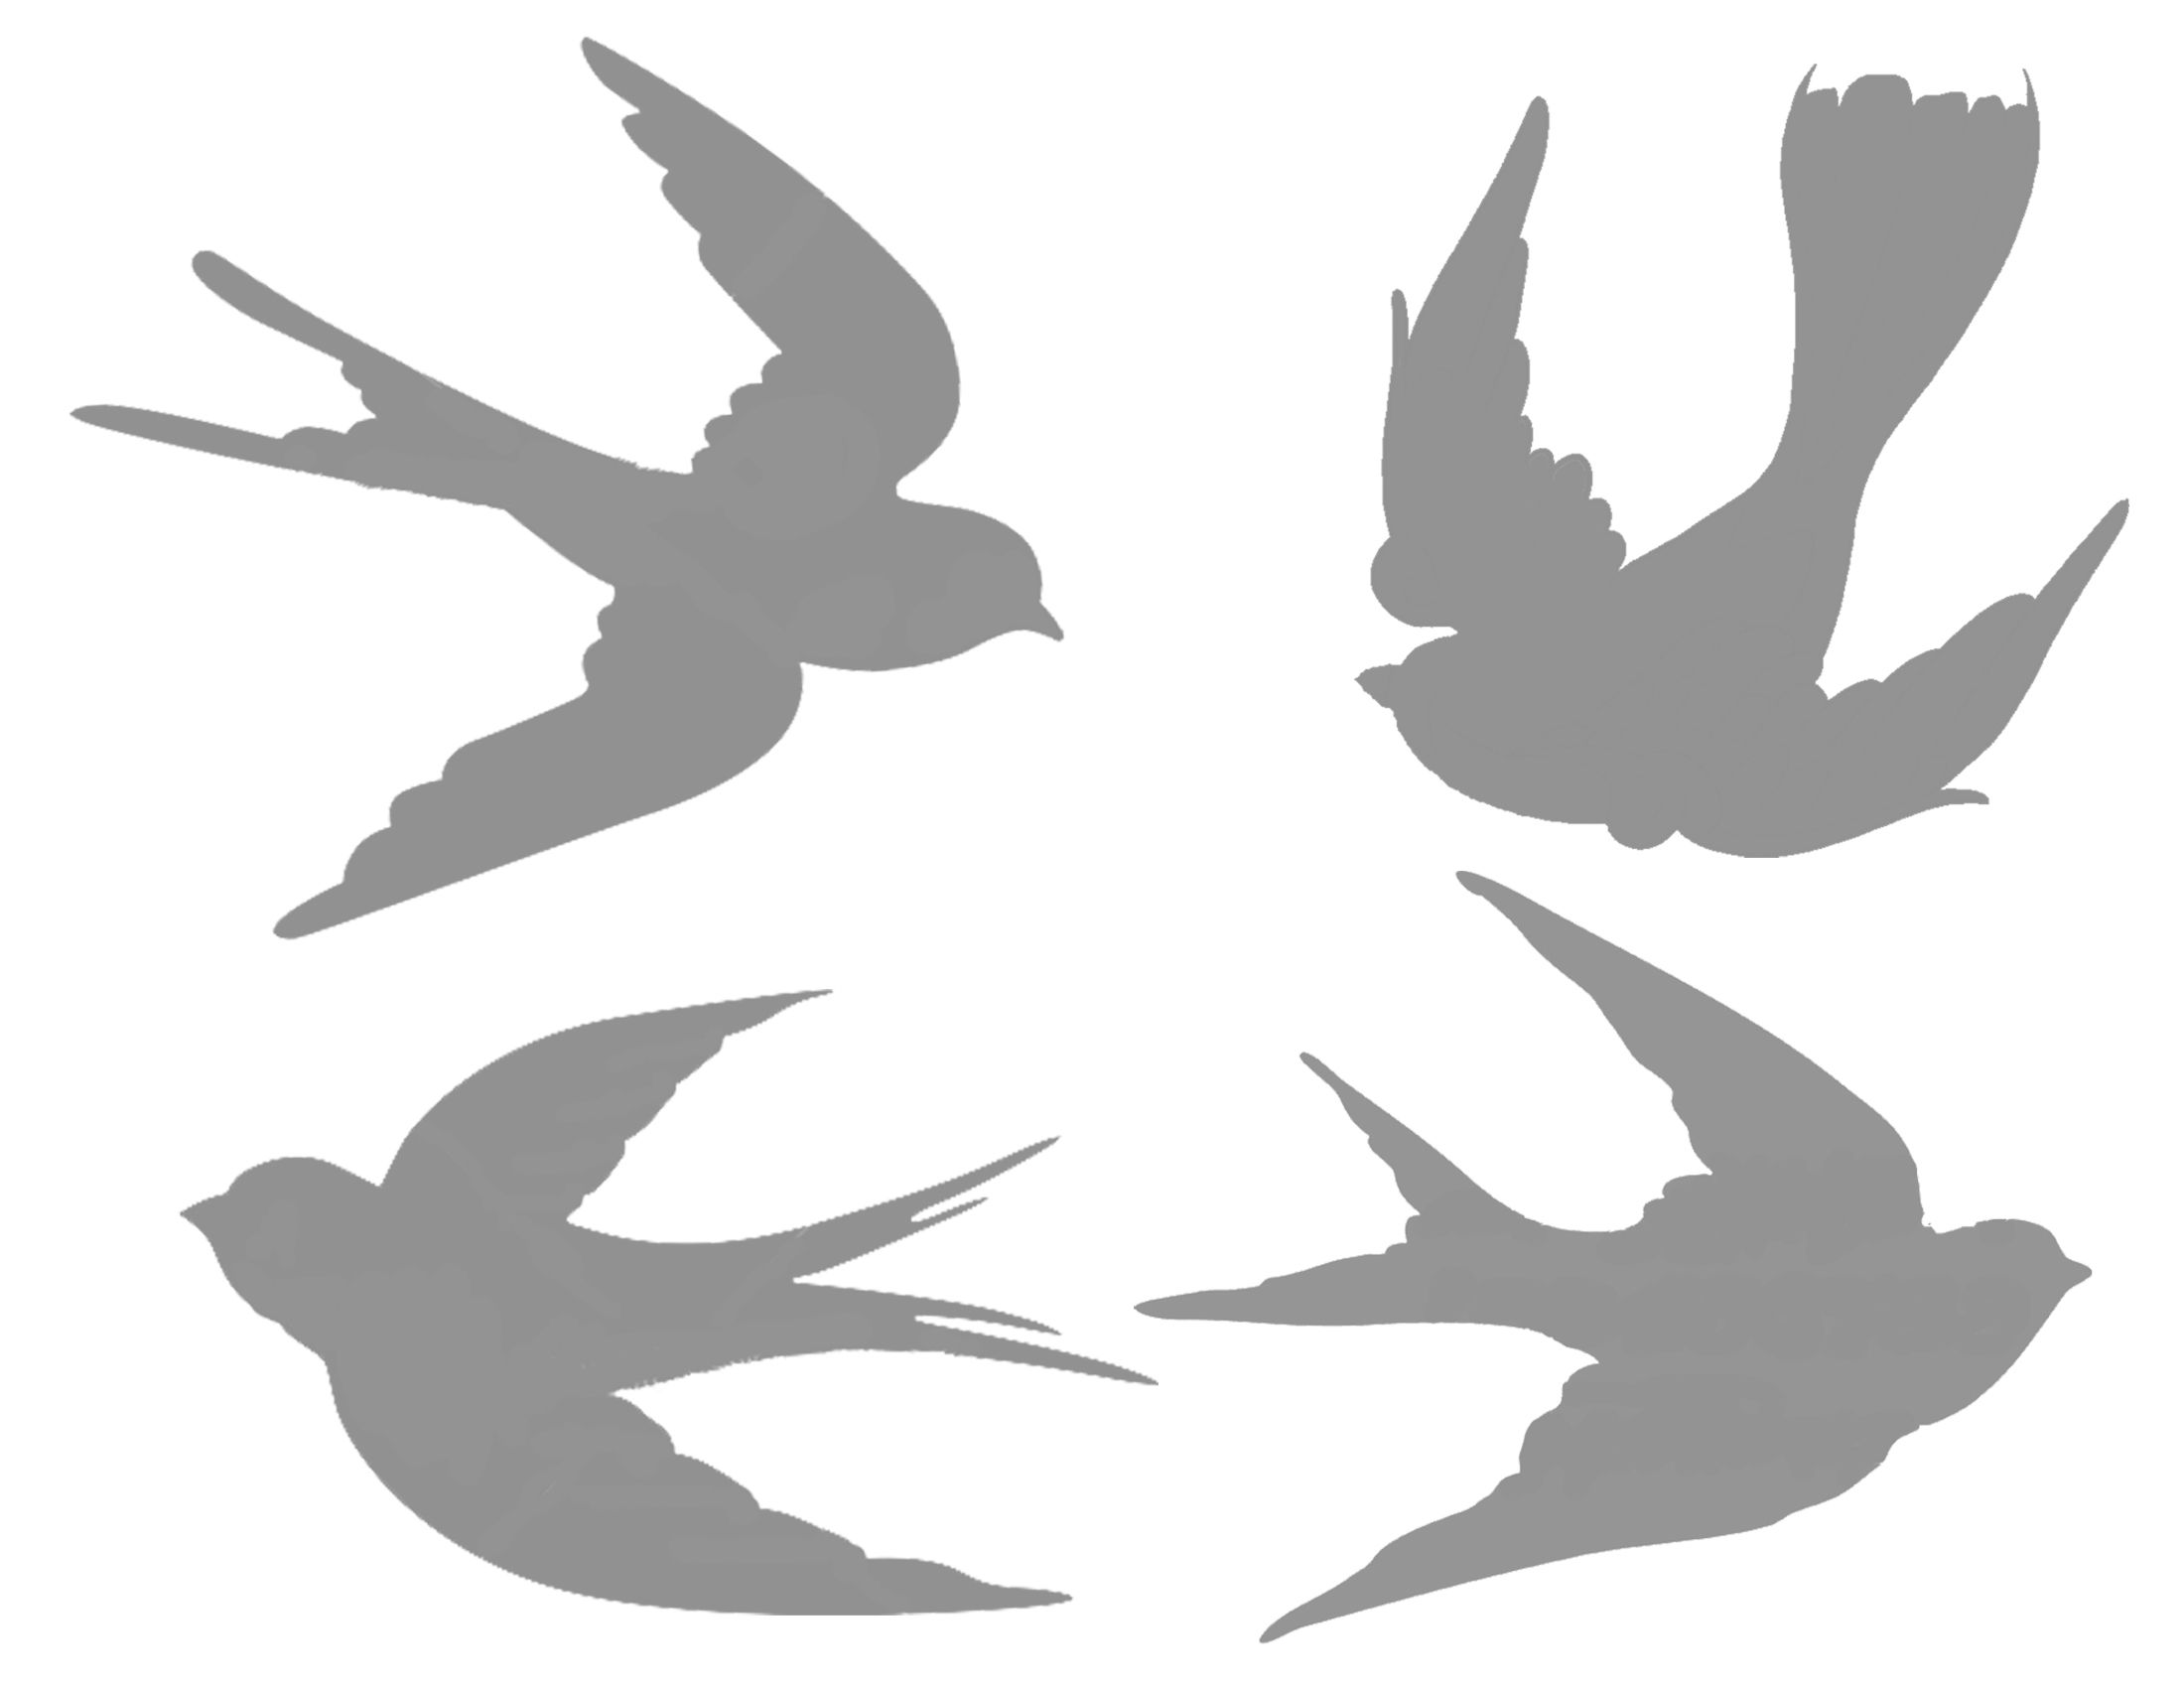 Swallow silhouettes u pinteresu